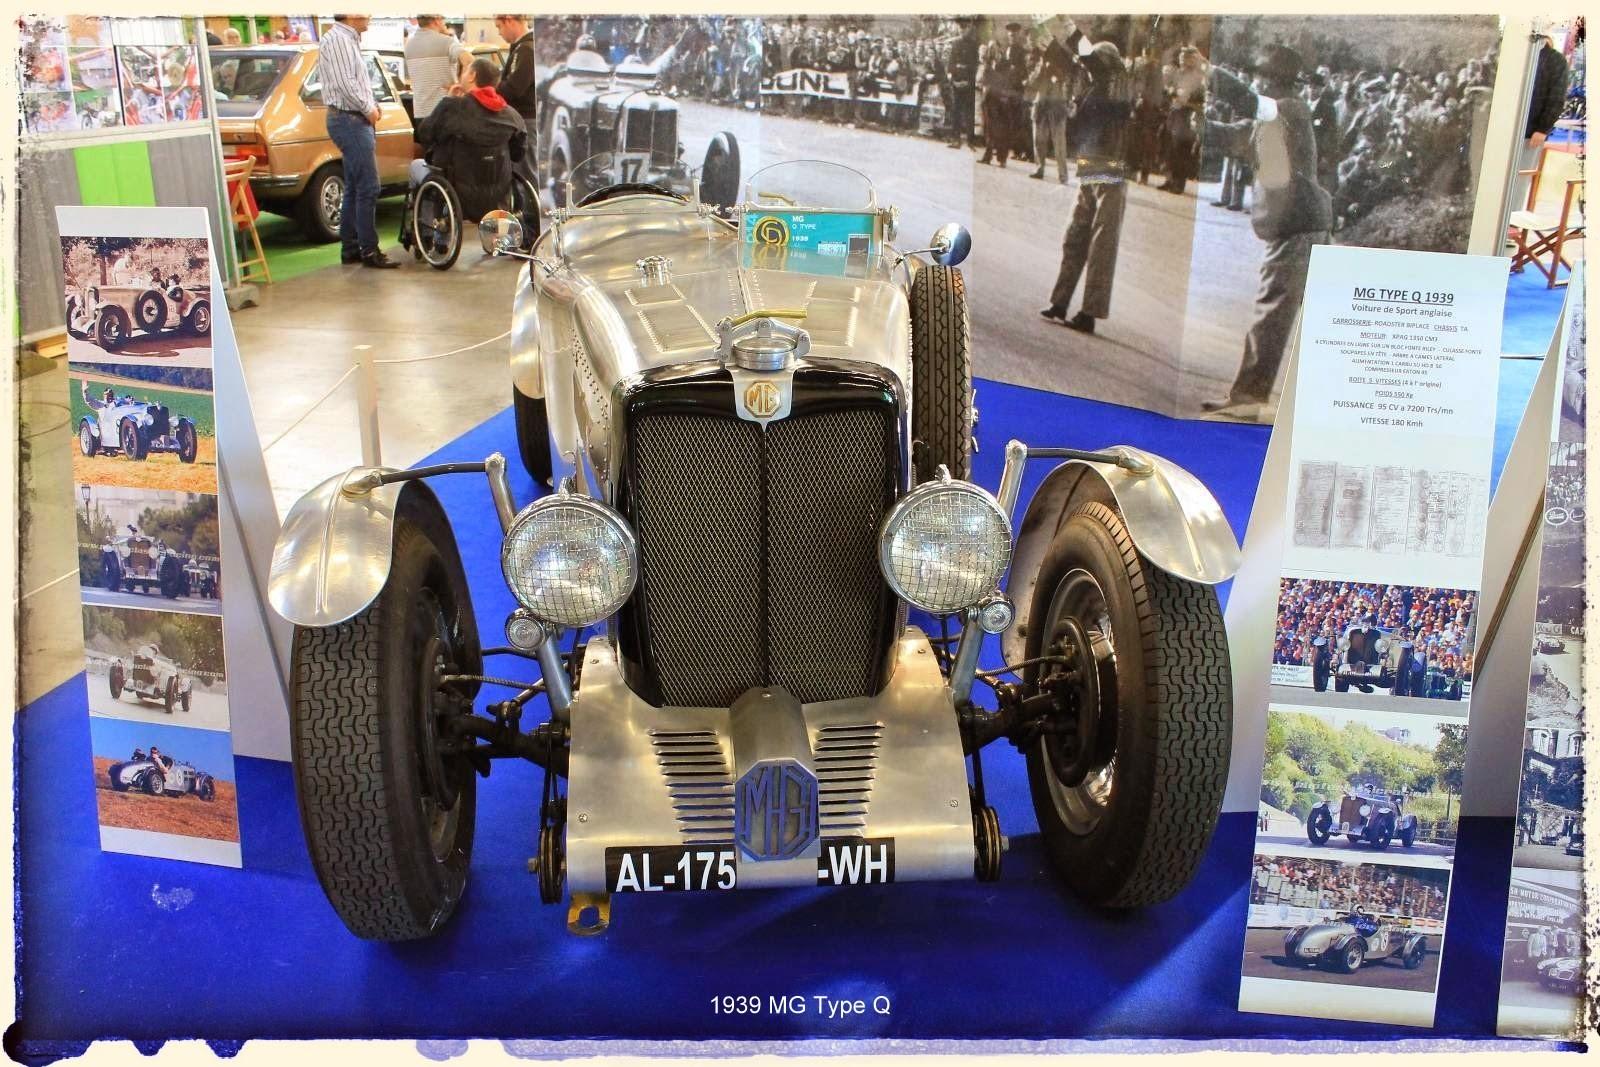 Automédon - 1939 MG Type Q